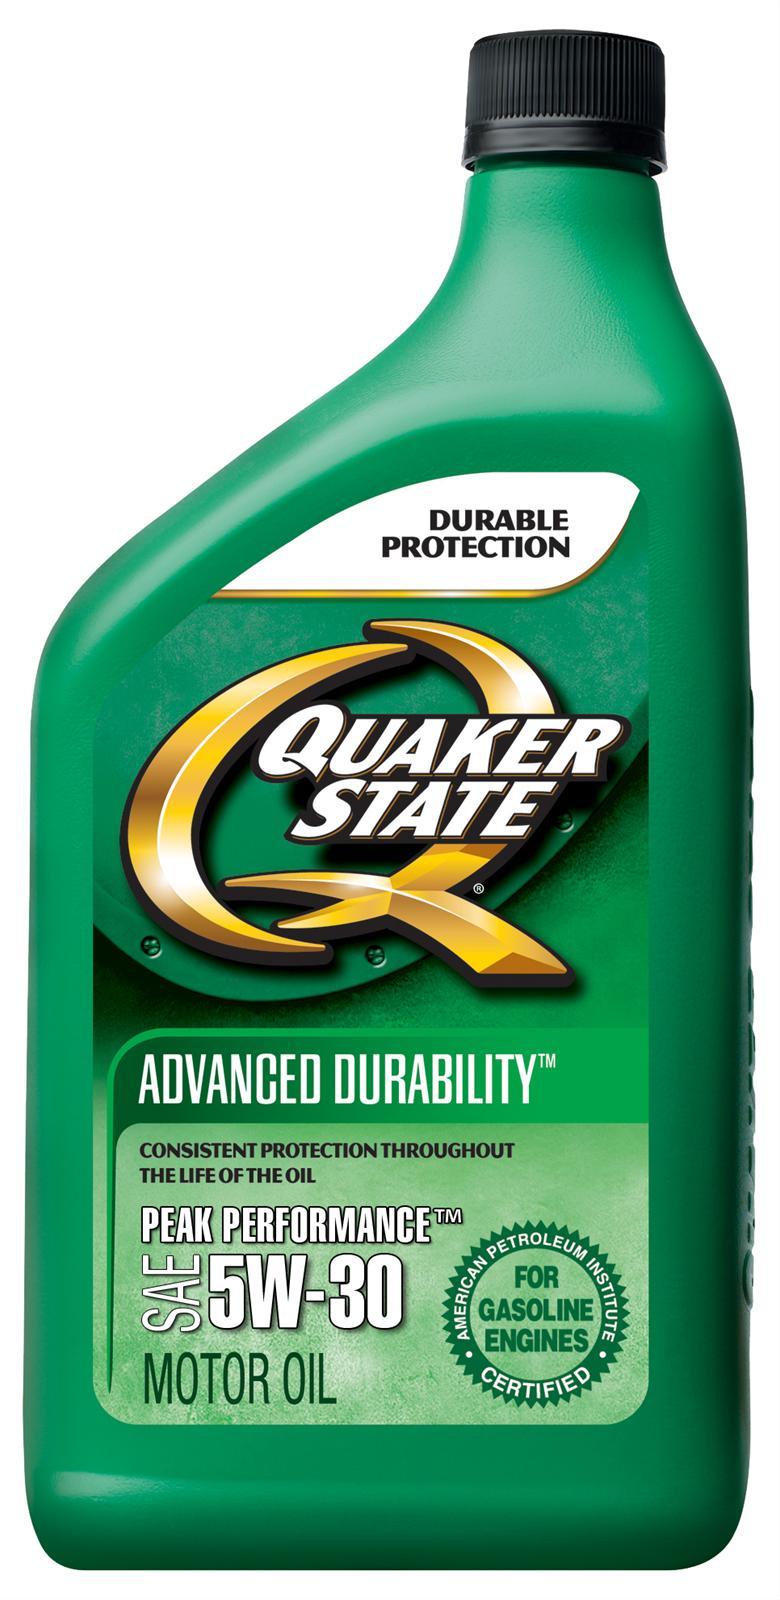 Quaker State Advanced Durability Motor Oil 550035180 12